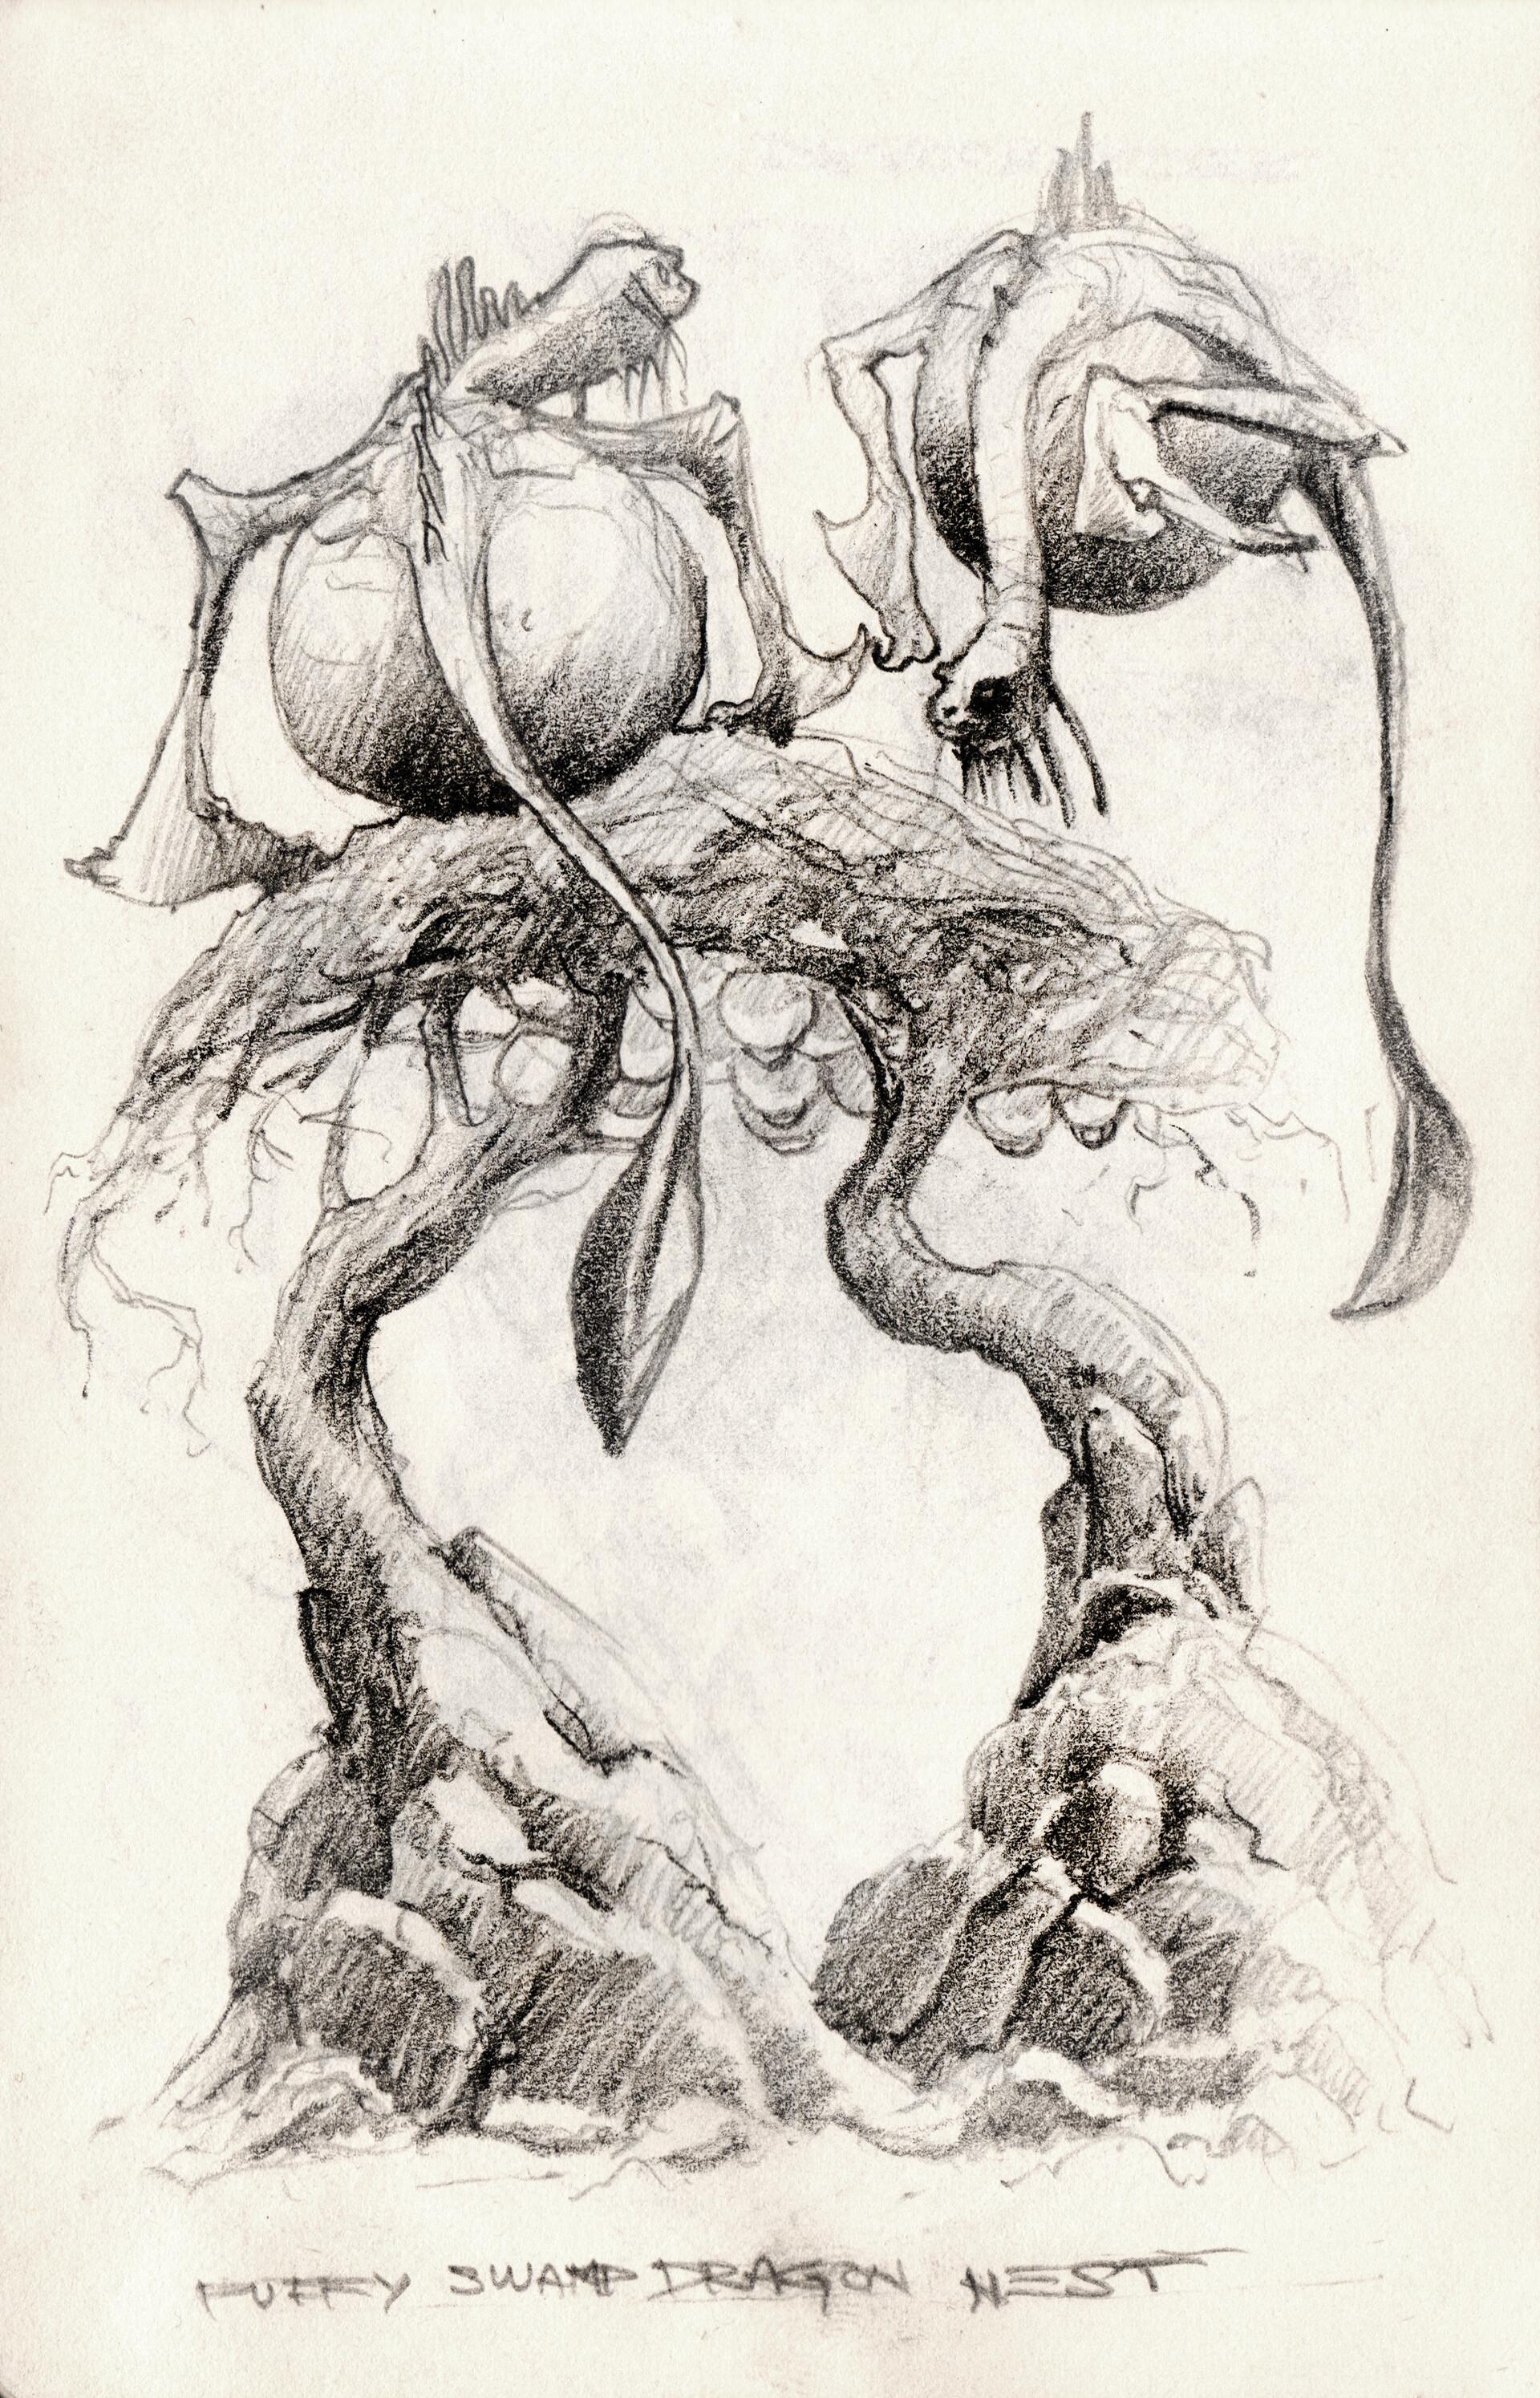 Swamp Dragon floating nest